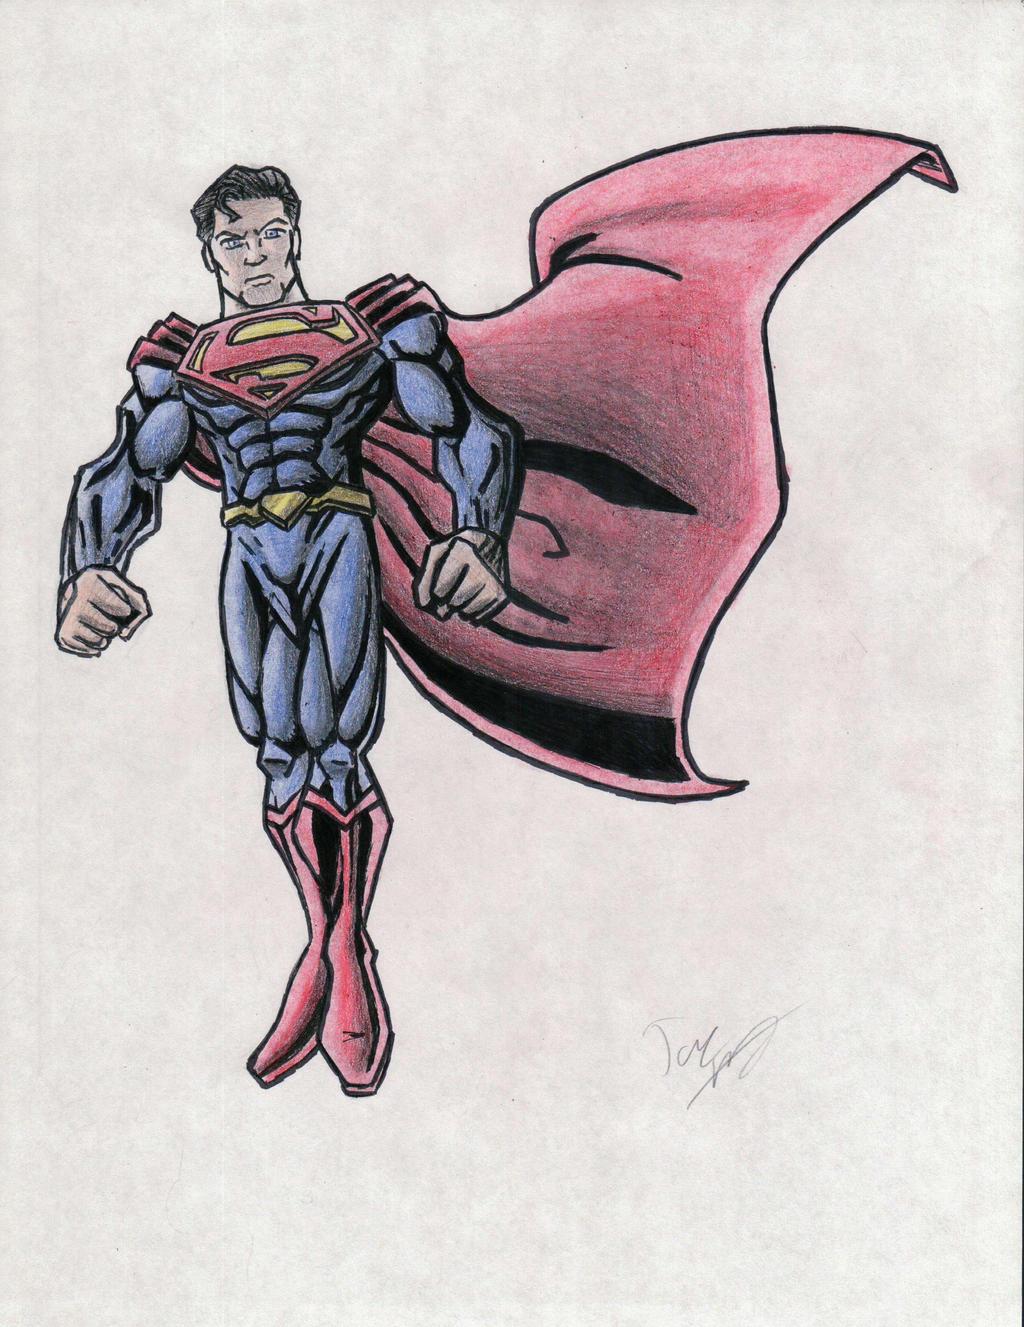 Injustice Superman by Twinkie5000